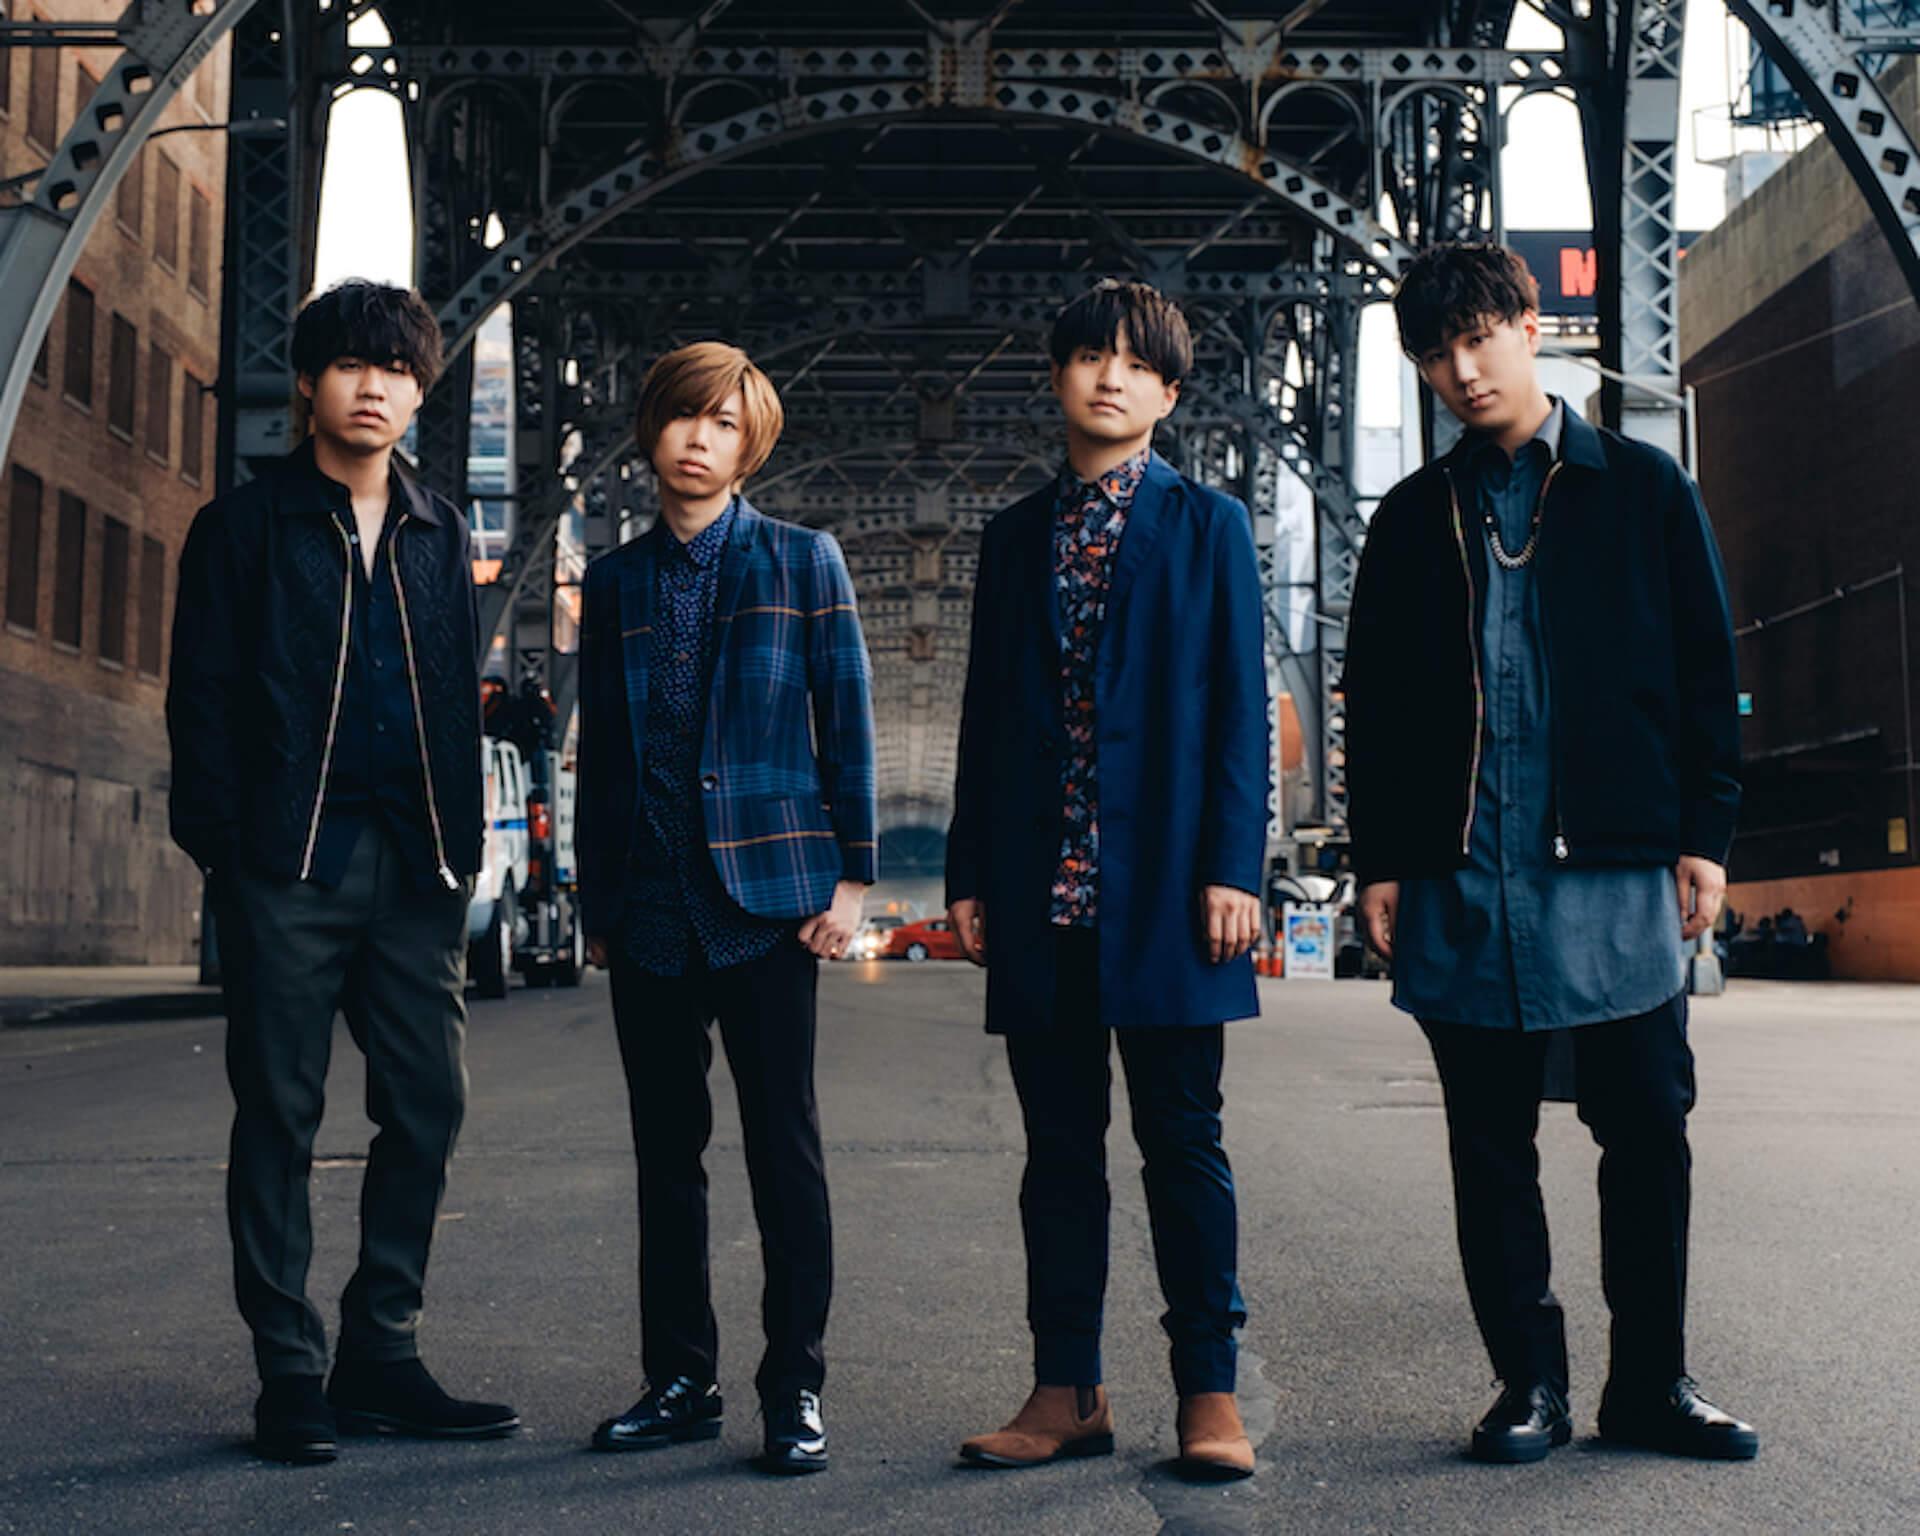 Official髭男dismが渋谷をジャック!『Traveler』発売記念、ジャックポスターが登場|渋谷某所で未発表曲の解禁も music191007_higedan_1